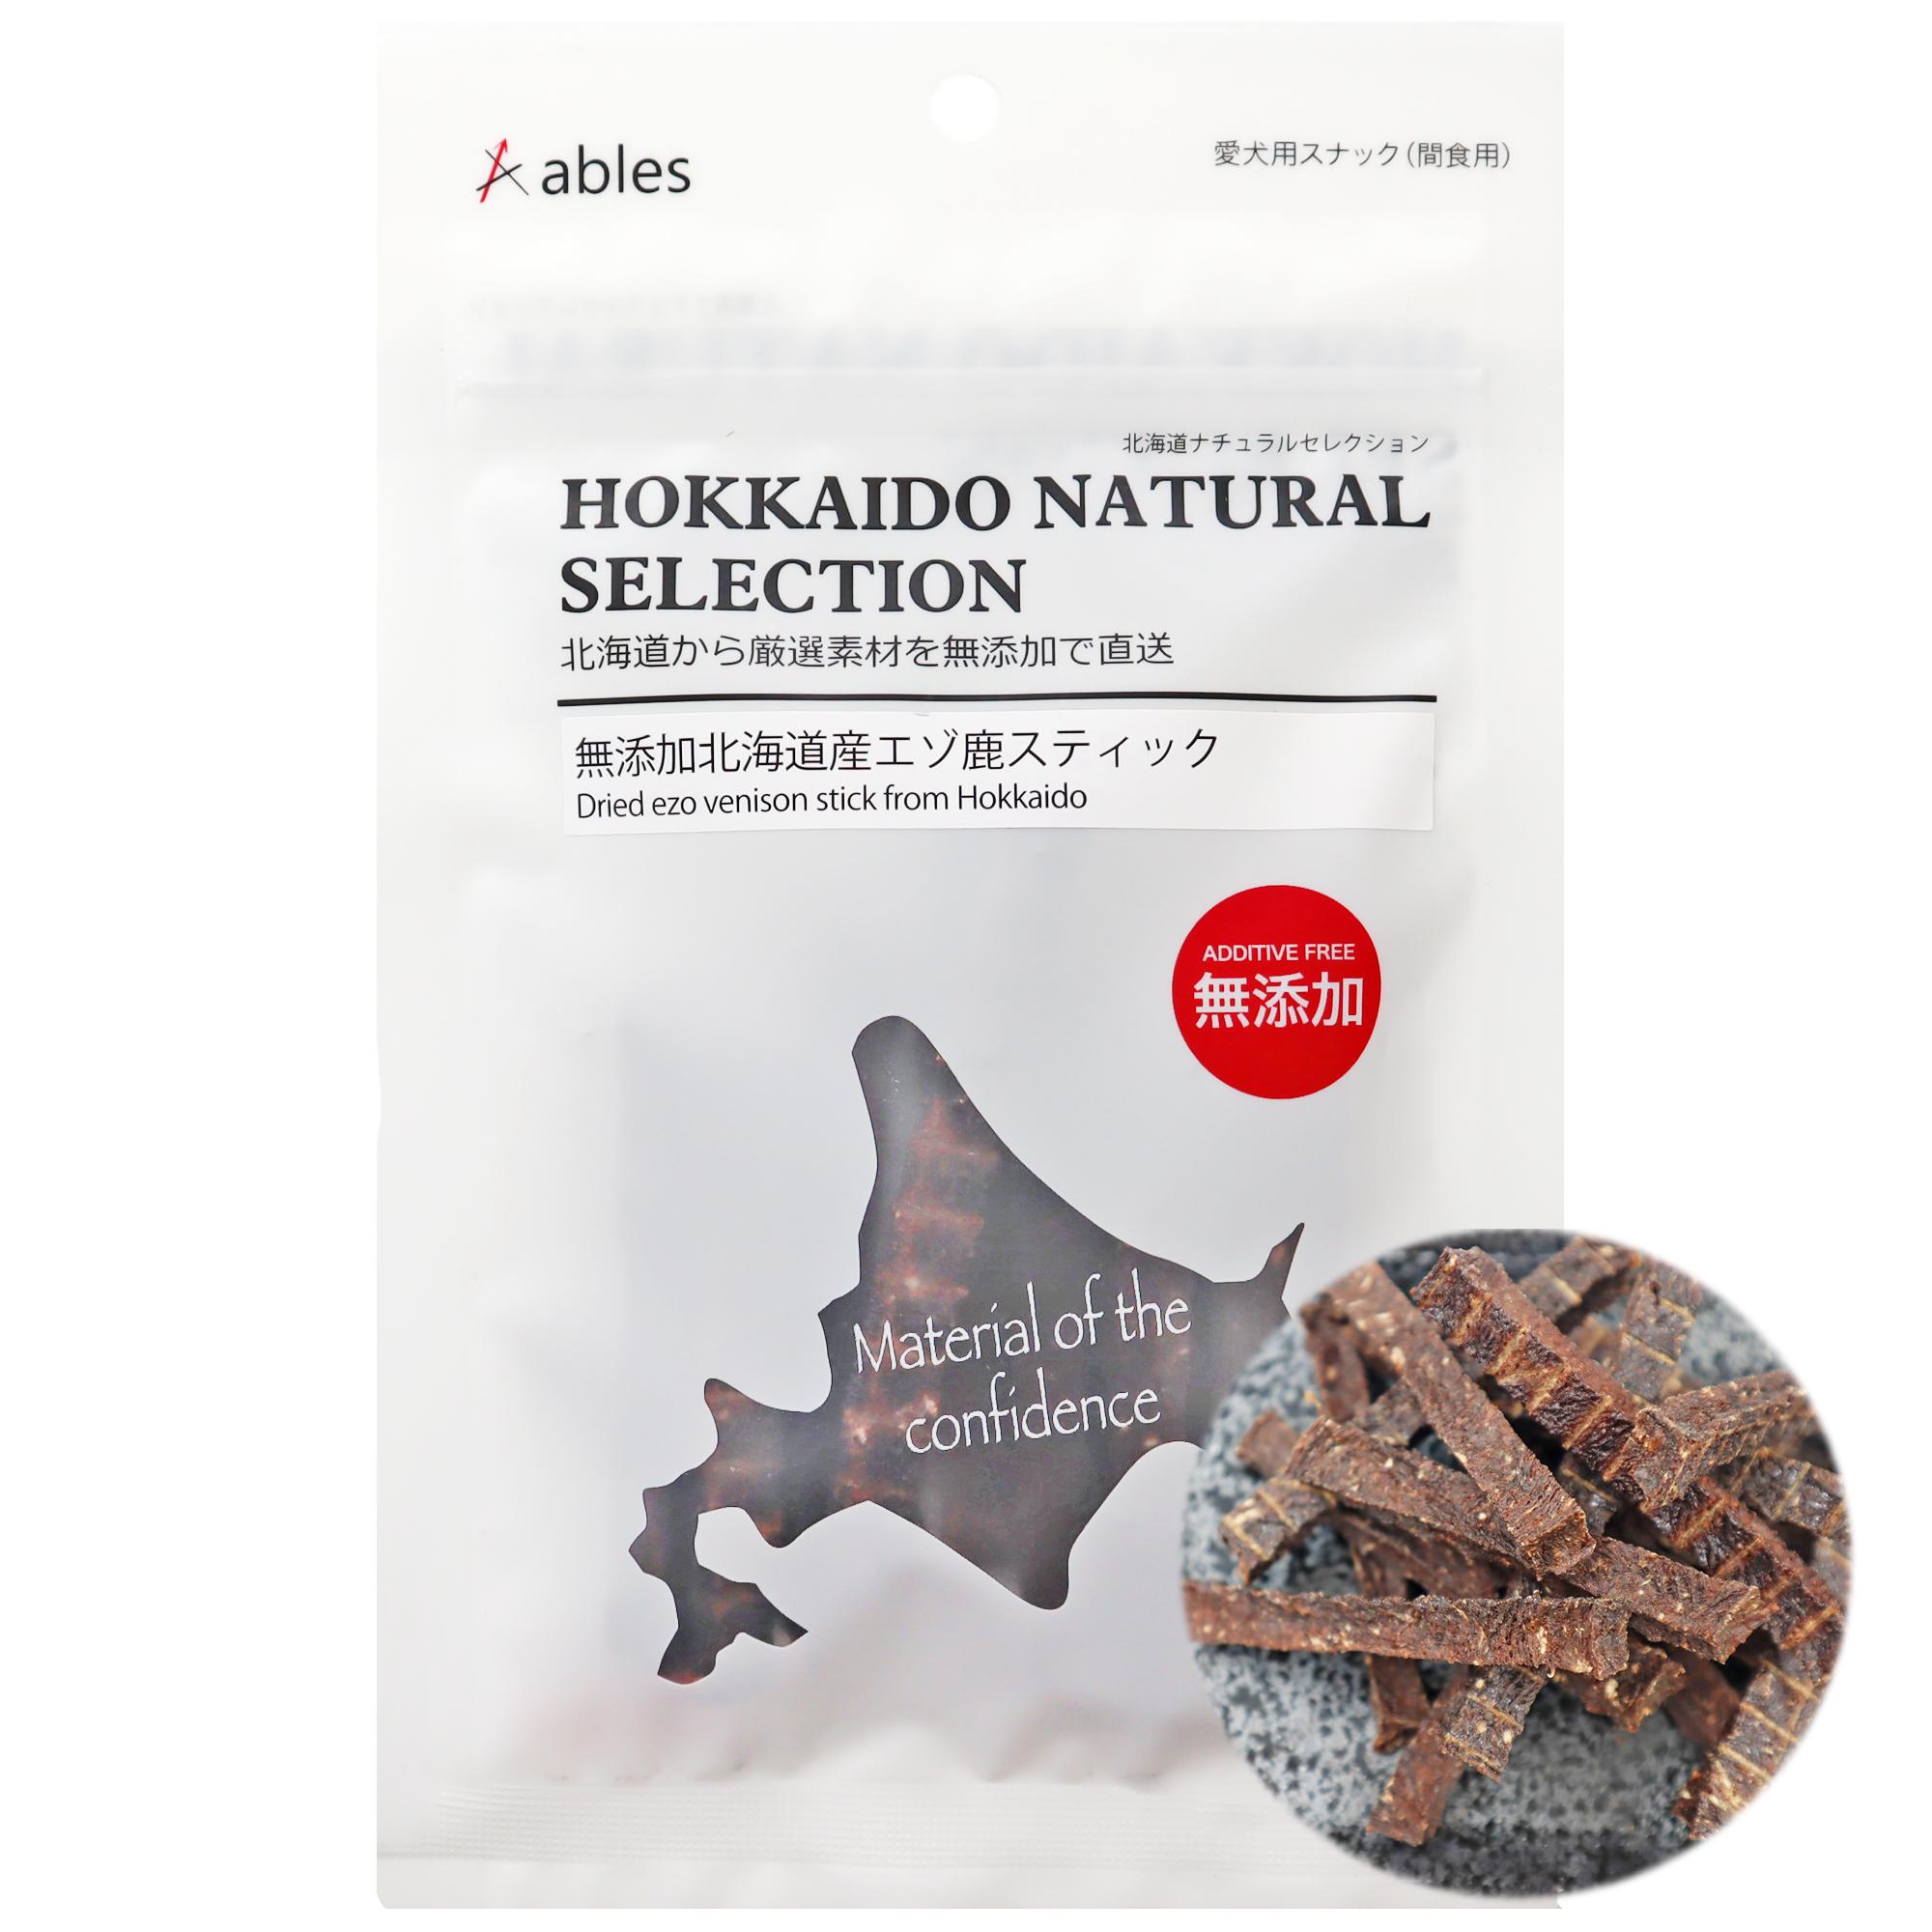 HOKKAIDO NATURAL SELECTION 無添加北海道産エゾ鹿スティック 25g